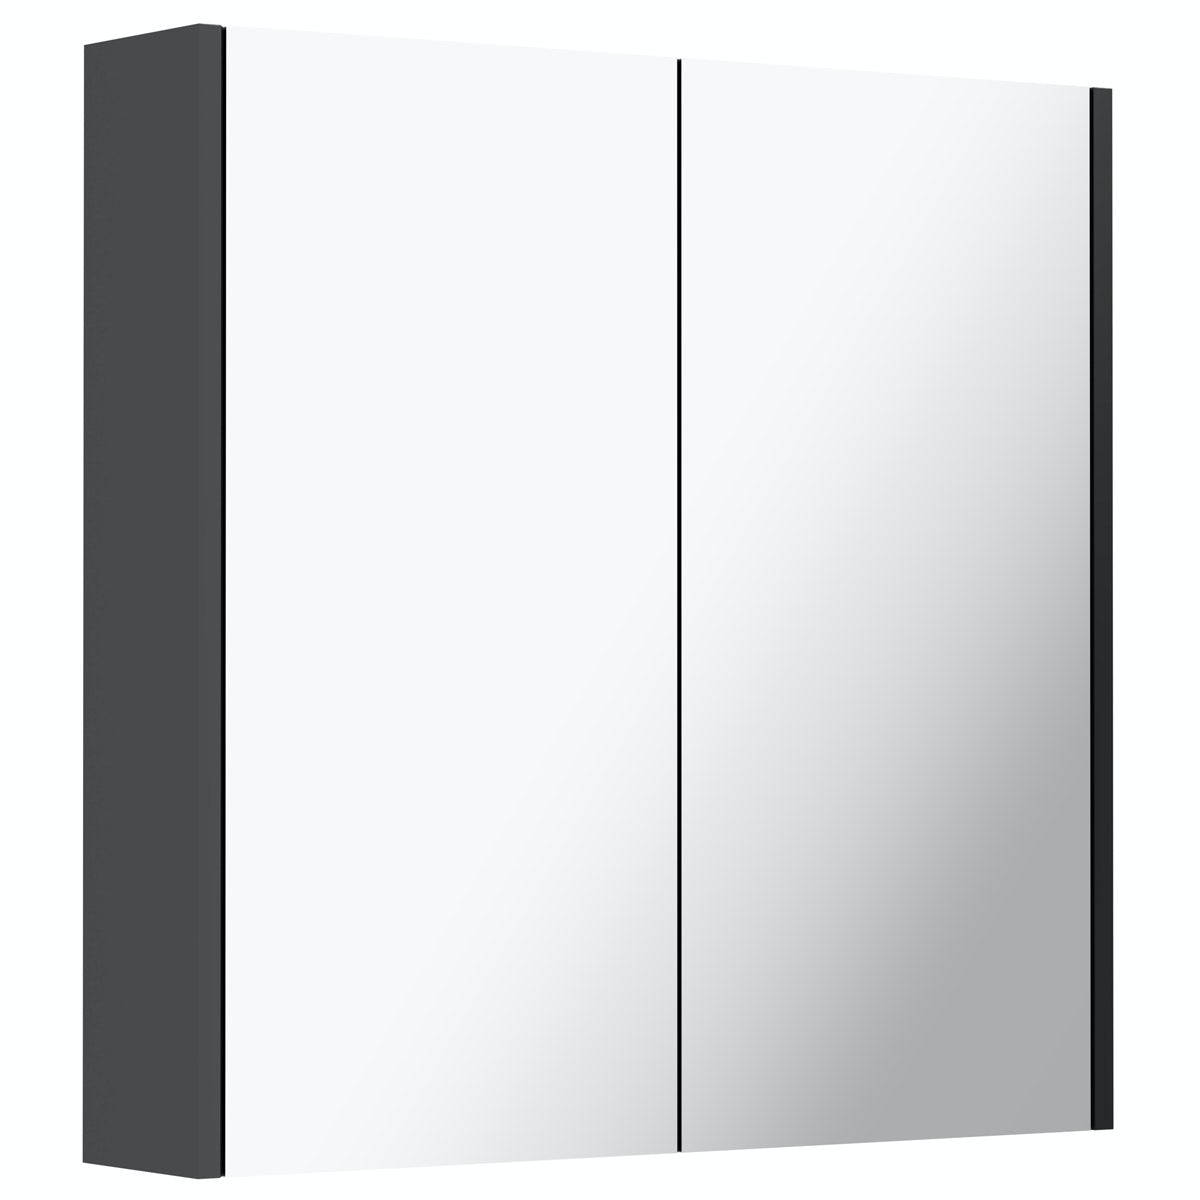 Mode Cooper anthracite mirror cabinet 600mm